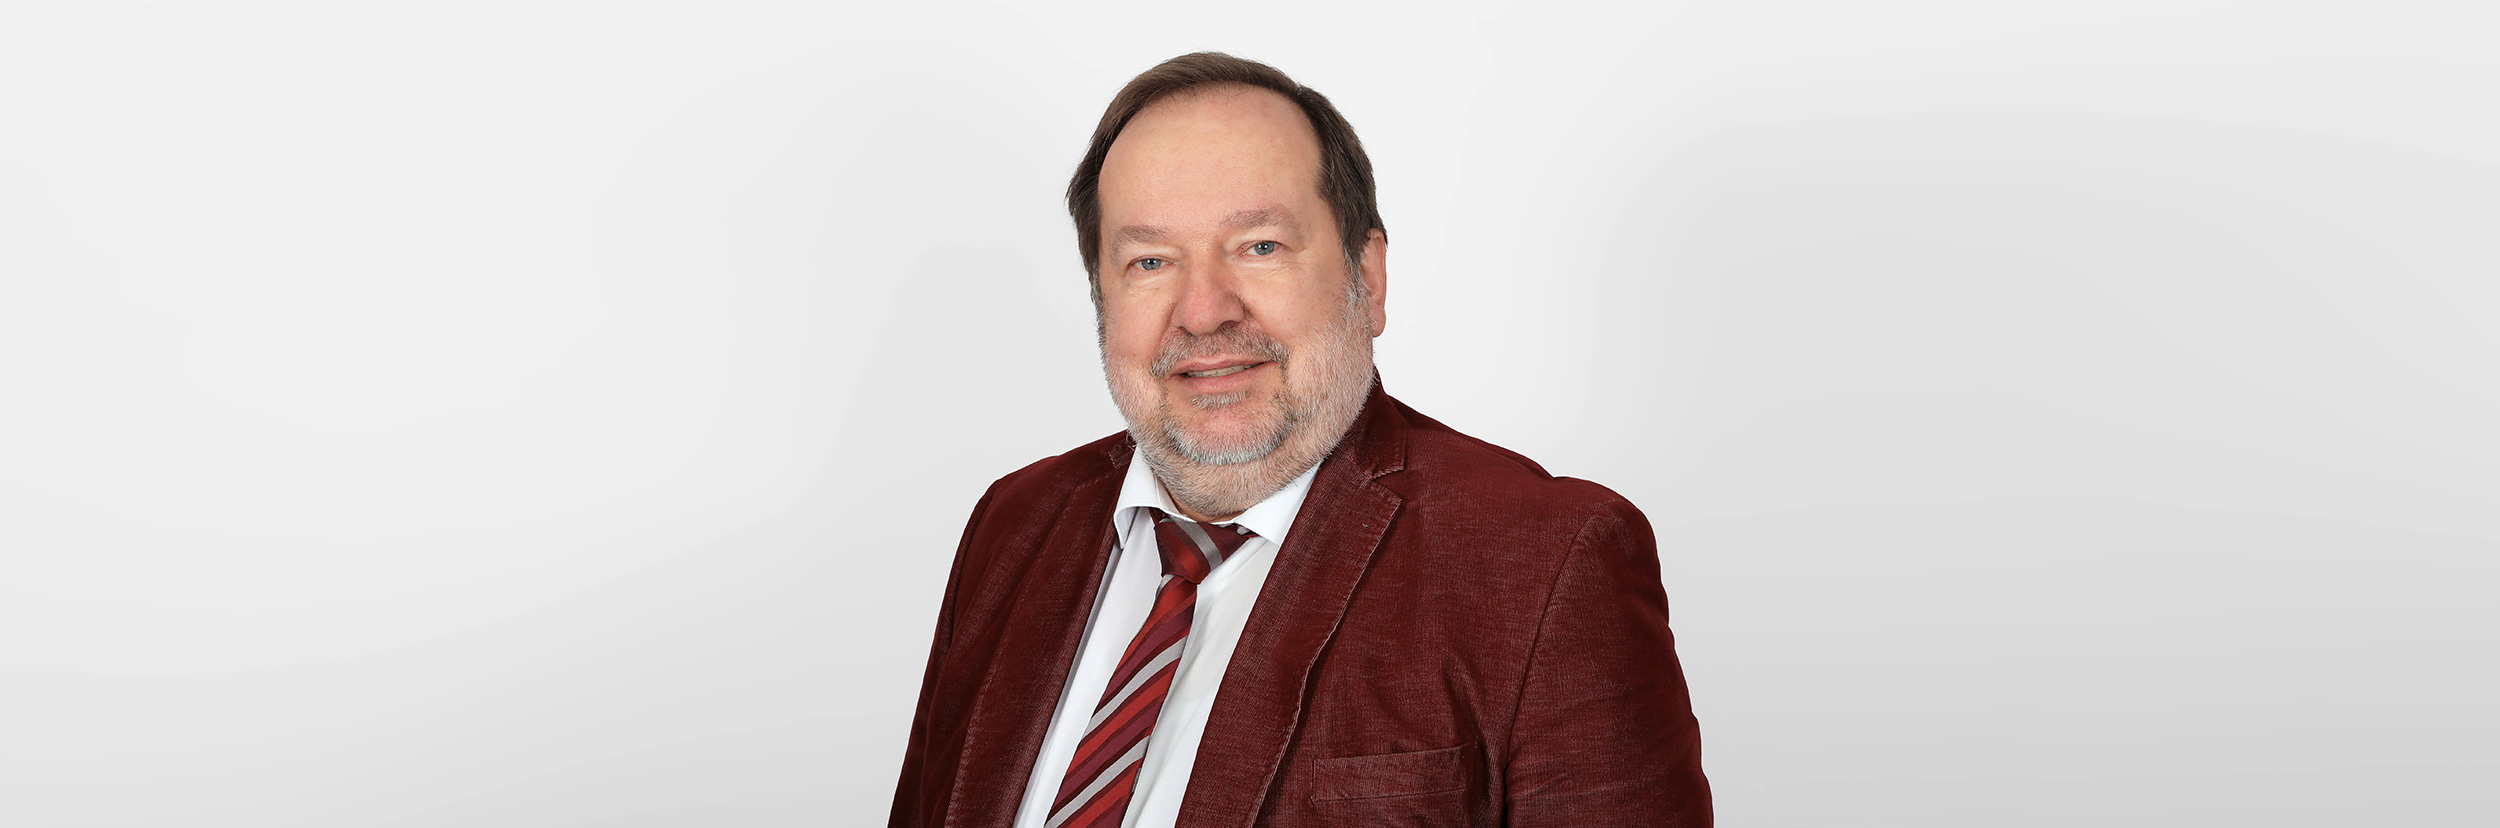 Advoteam Rechtswanwalt Thomas Heese